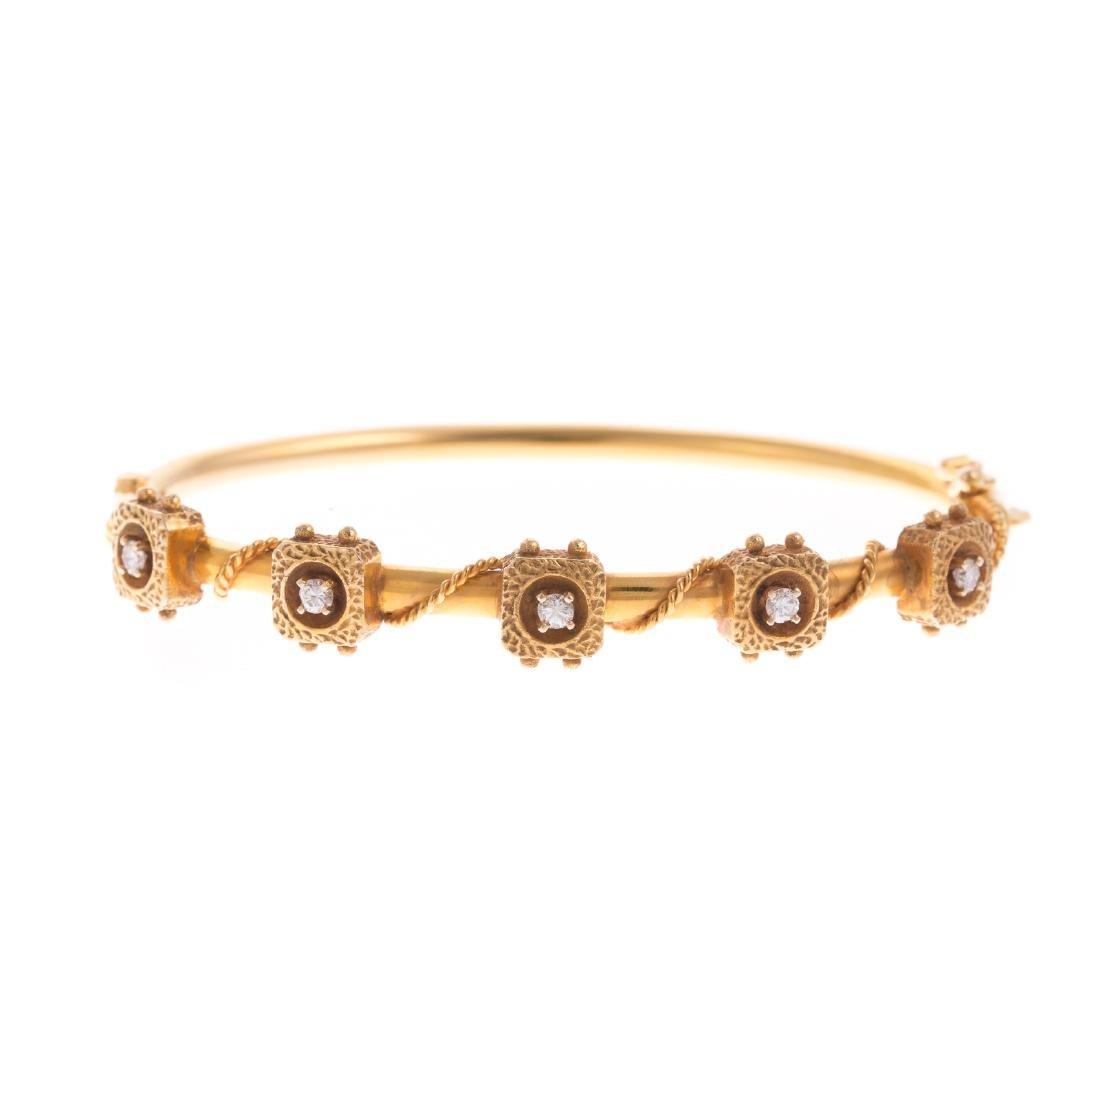 A Ladies Bangle Bracelet with Diamonds